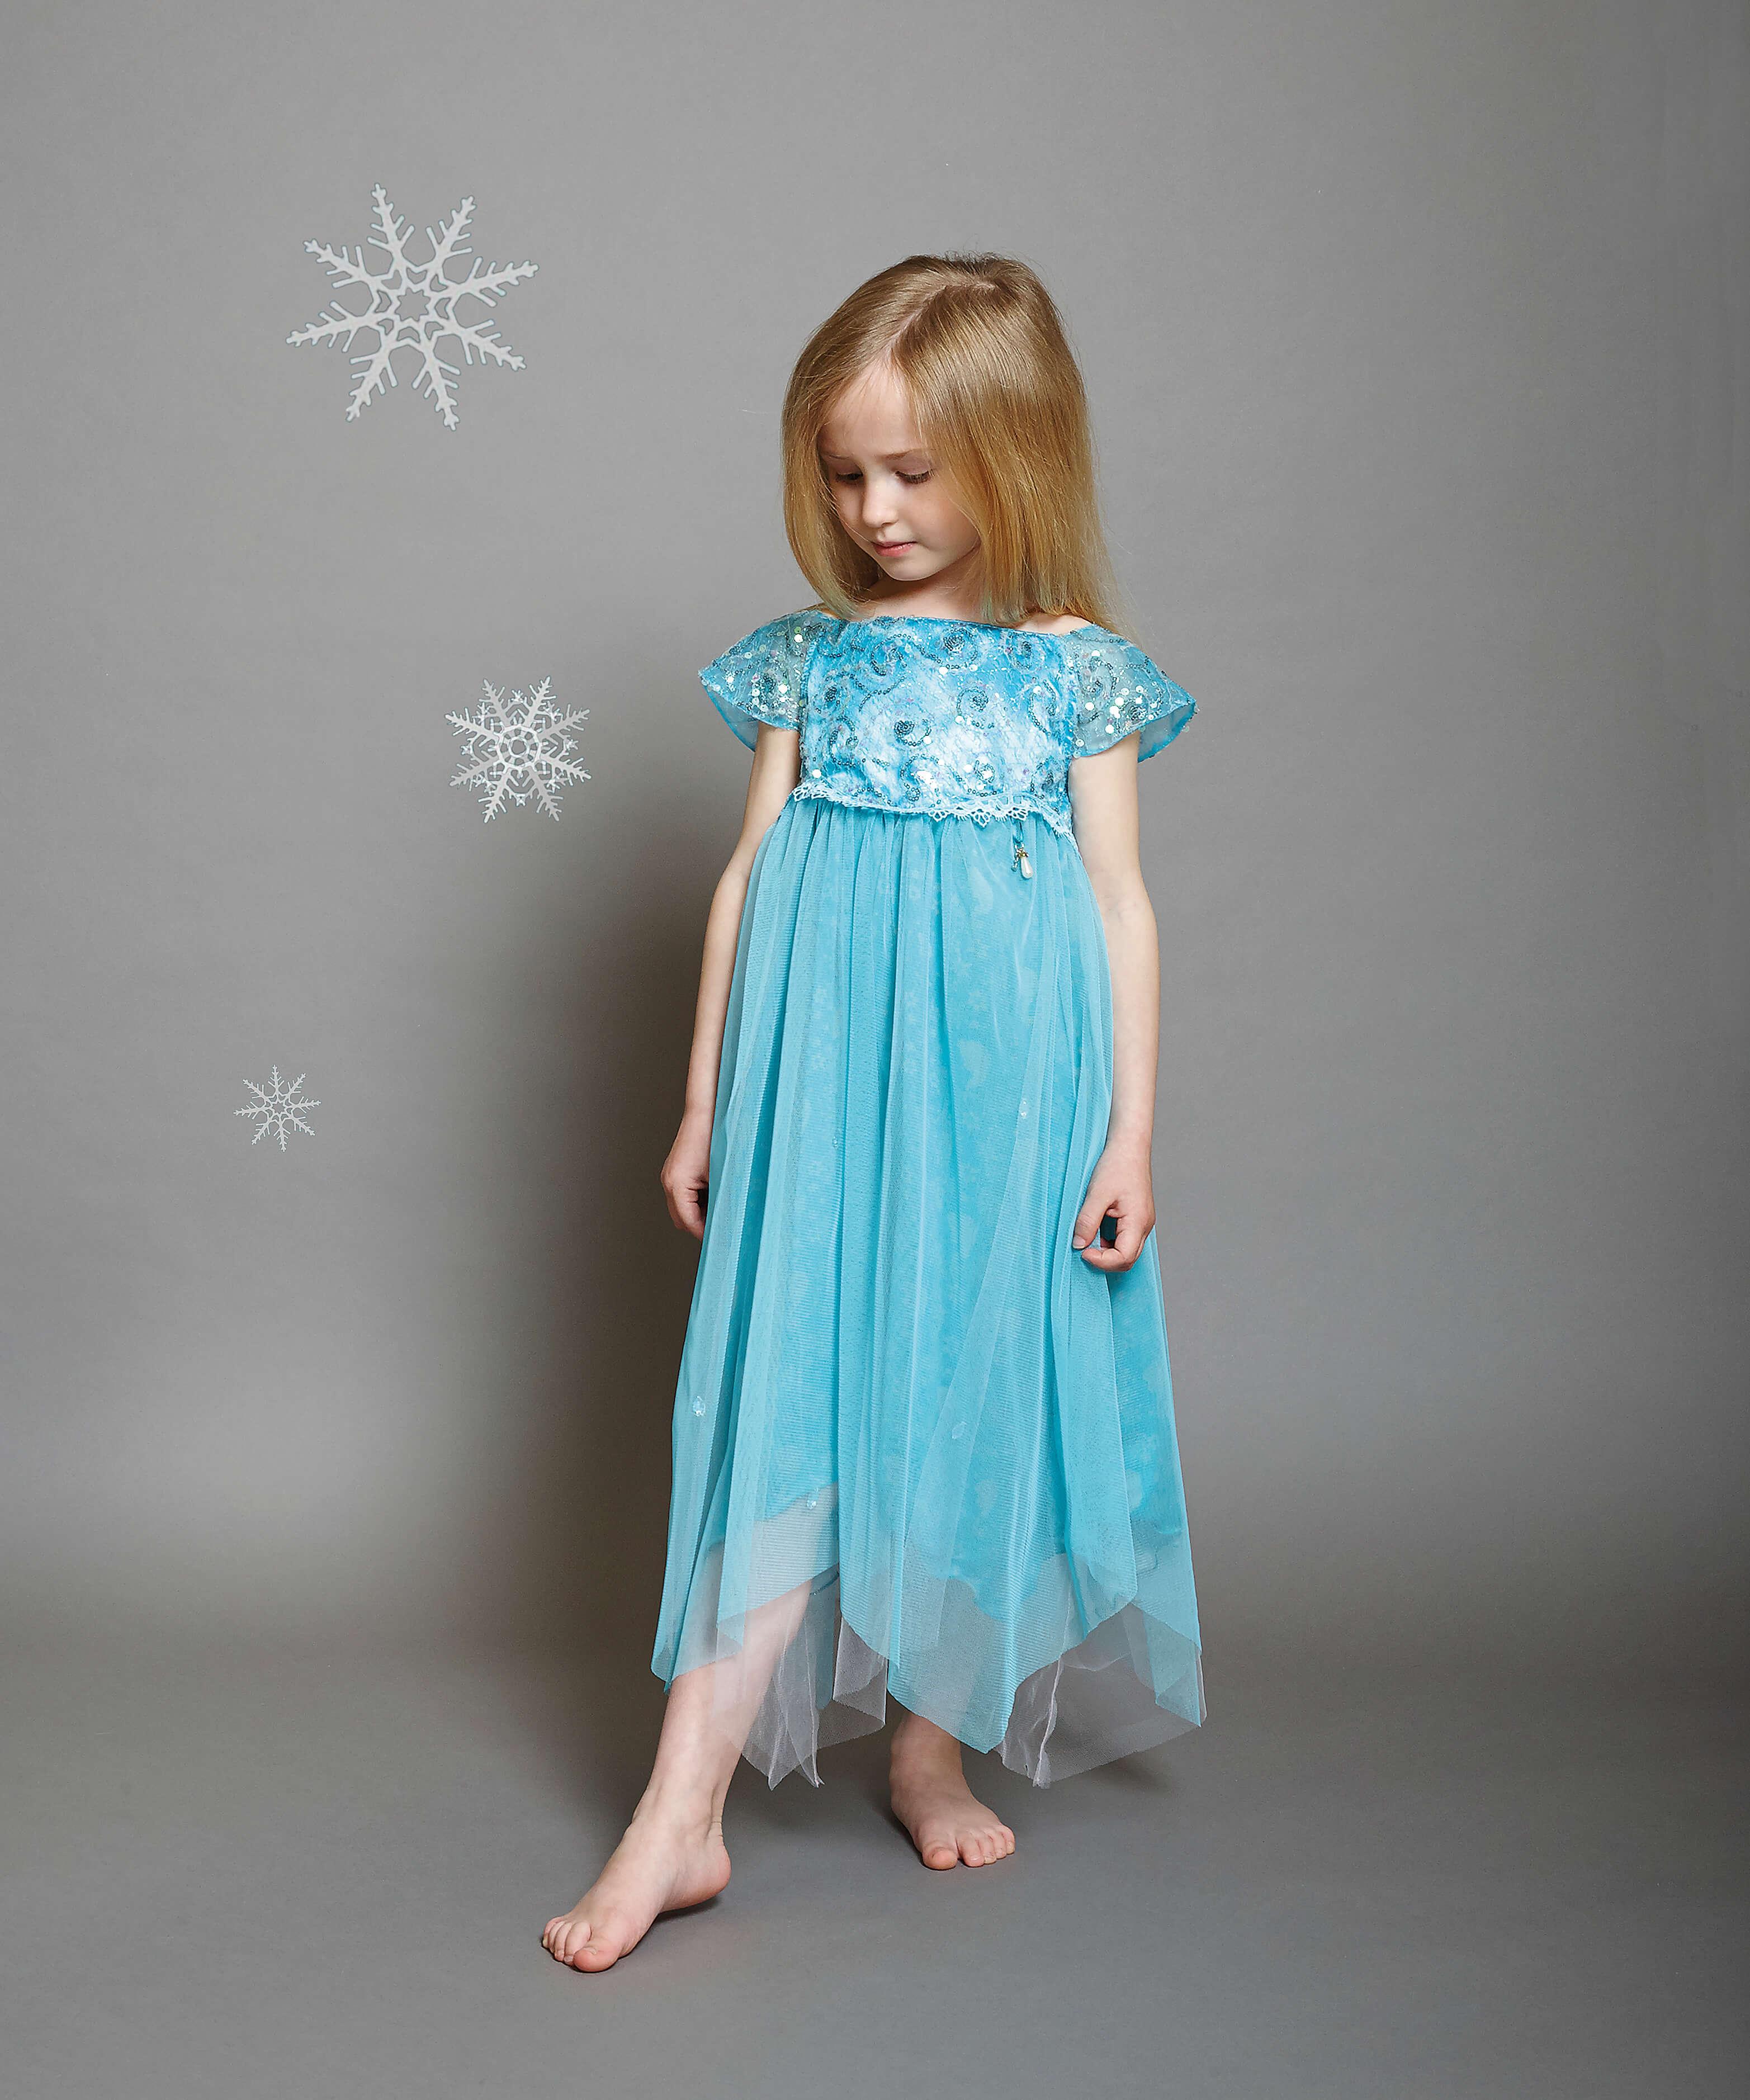 Disney Boutique Collection Elsa turquoise swirl seqin Dress